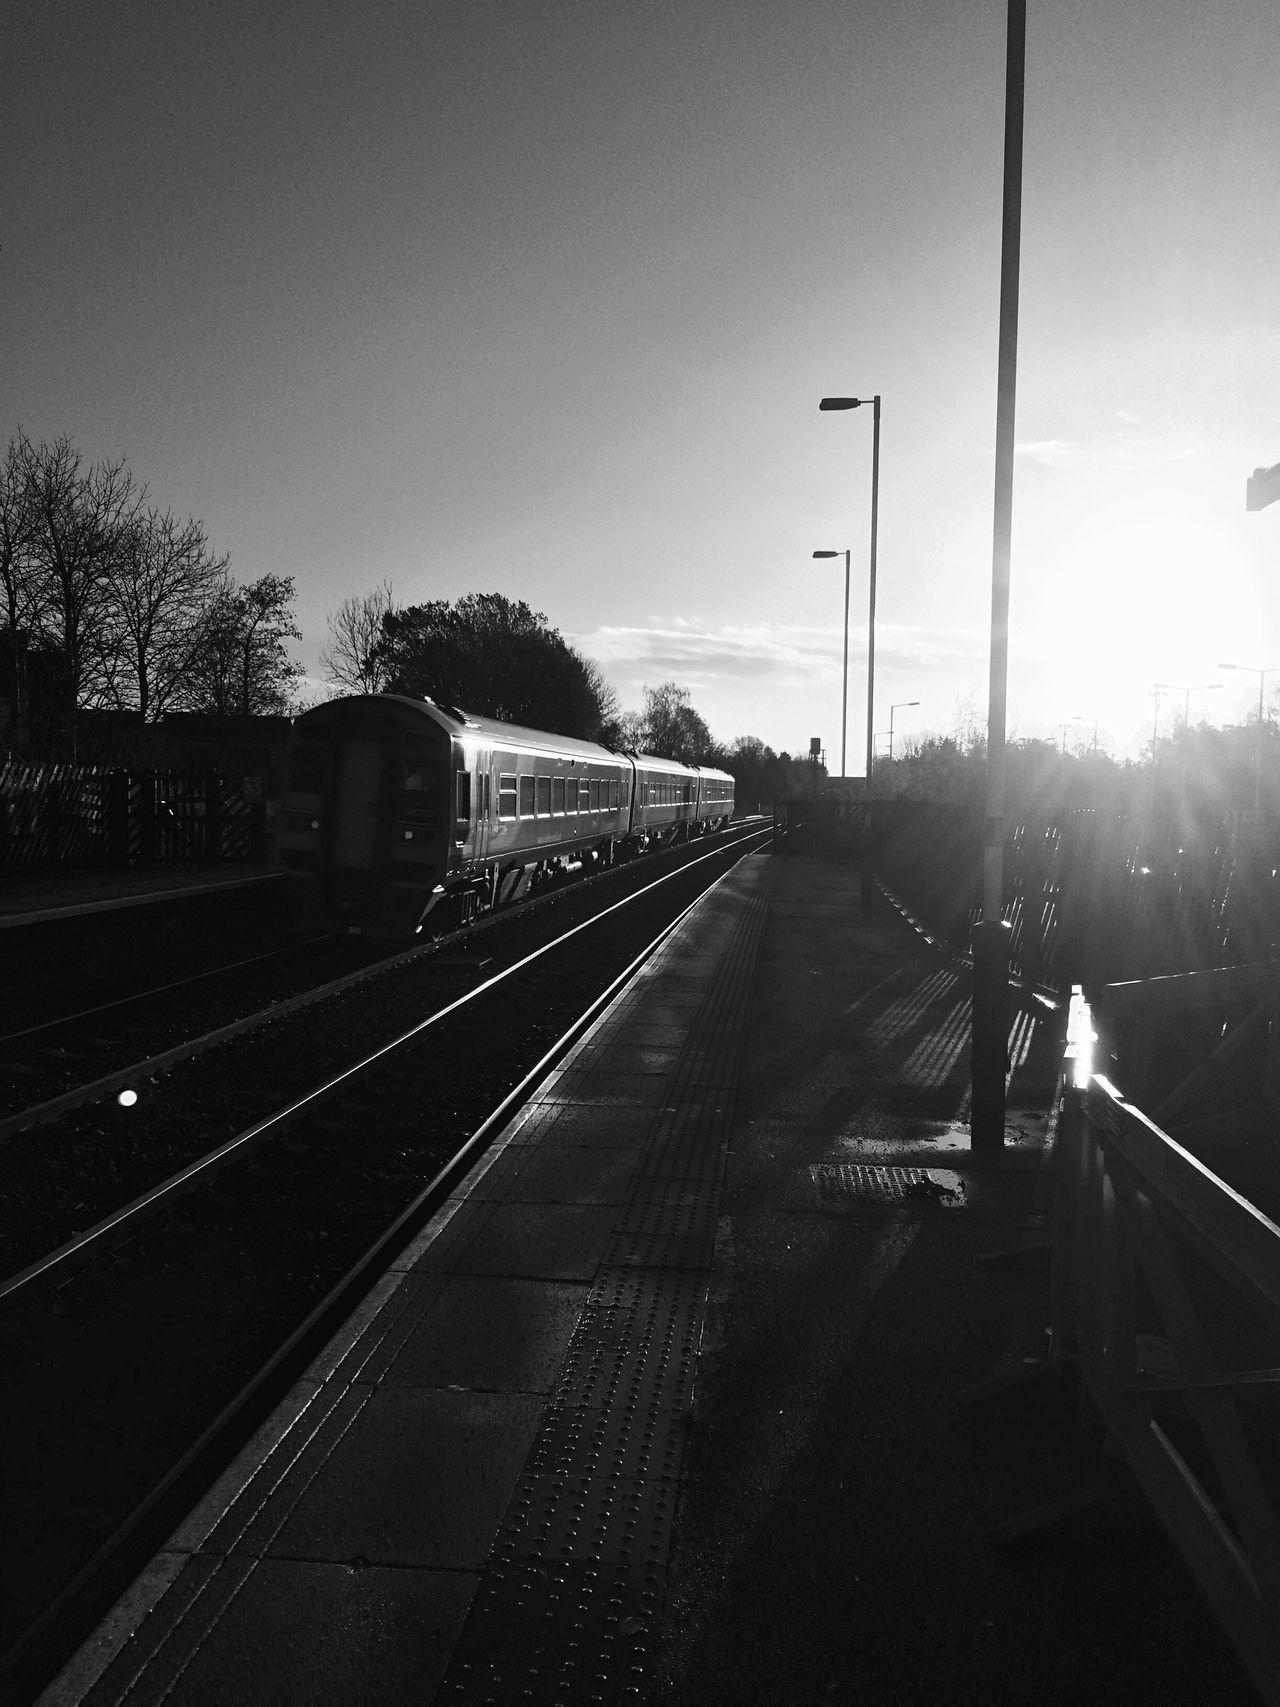 Blackandwhite Train at Garforth Station Cold Days